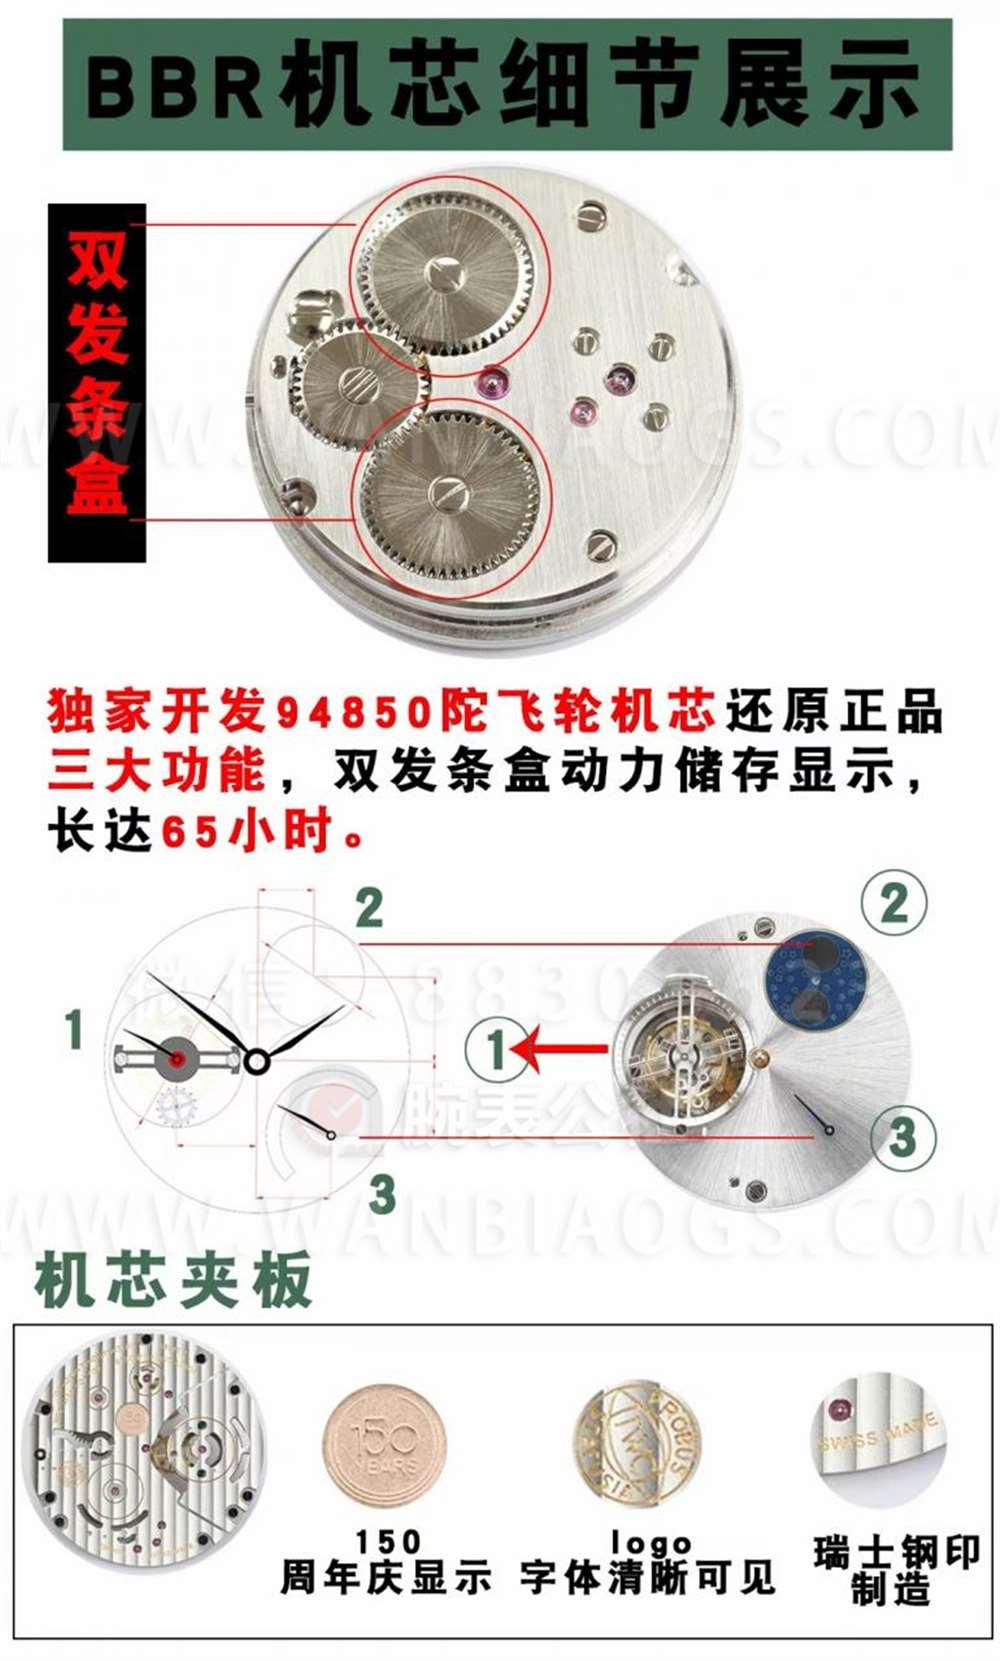 BBR厂万国恒定动力陀飞轮腕表深度评测